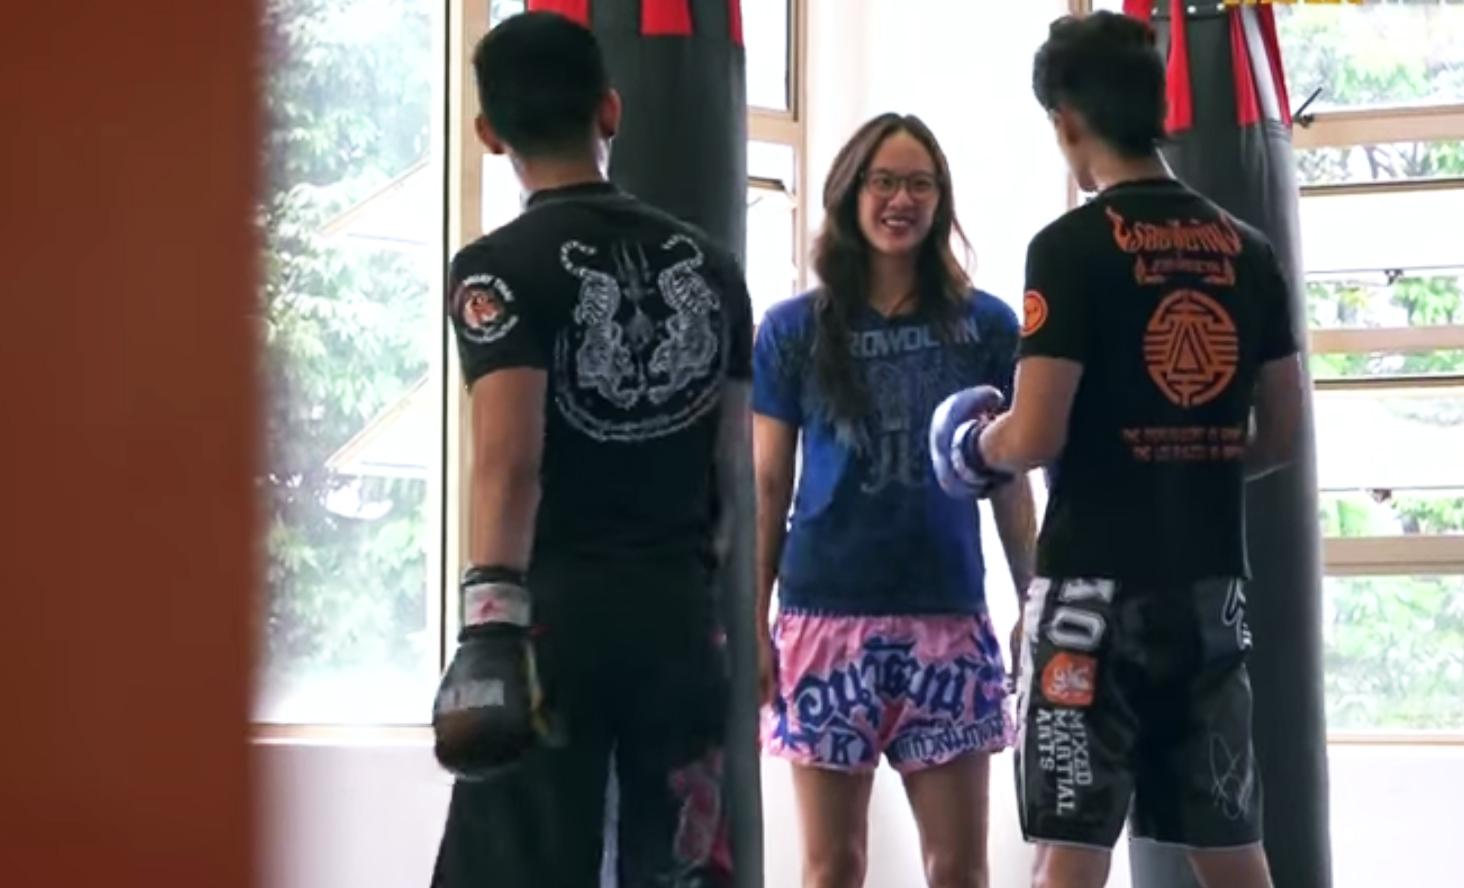 https://i2.wp.com/www.pinoyfitness.com/wp-content/uploads/2015/05/muay-thai-camp-beats-up-trainers.jpg